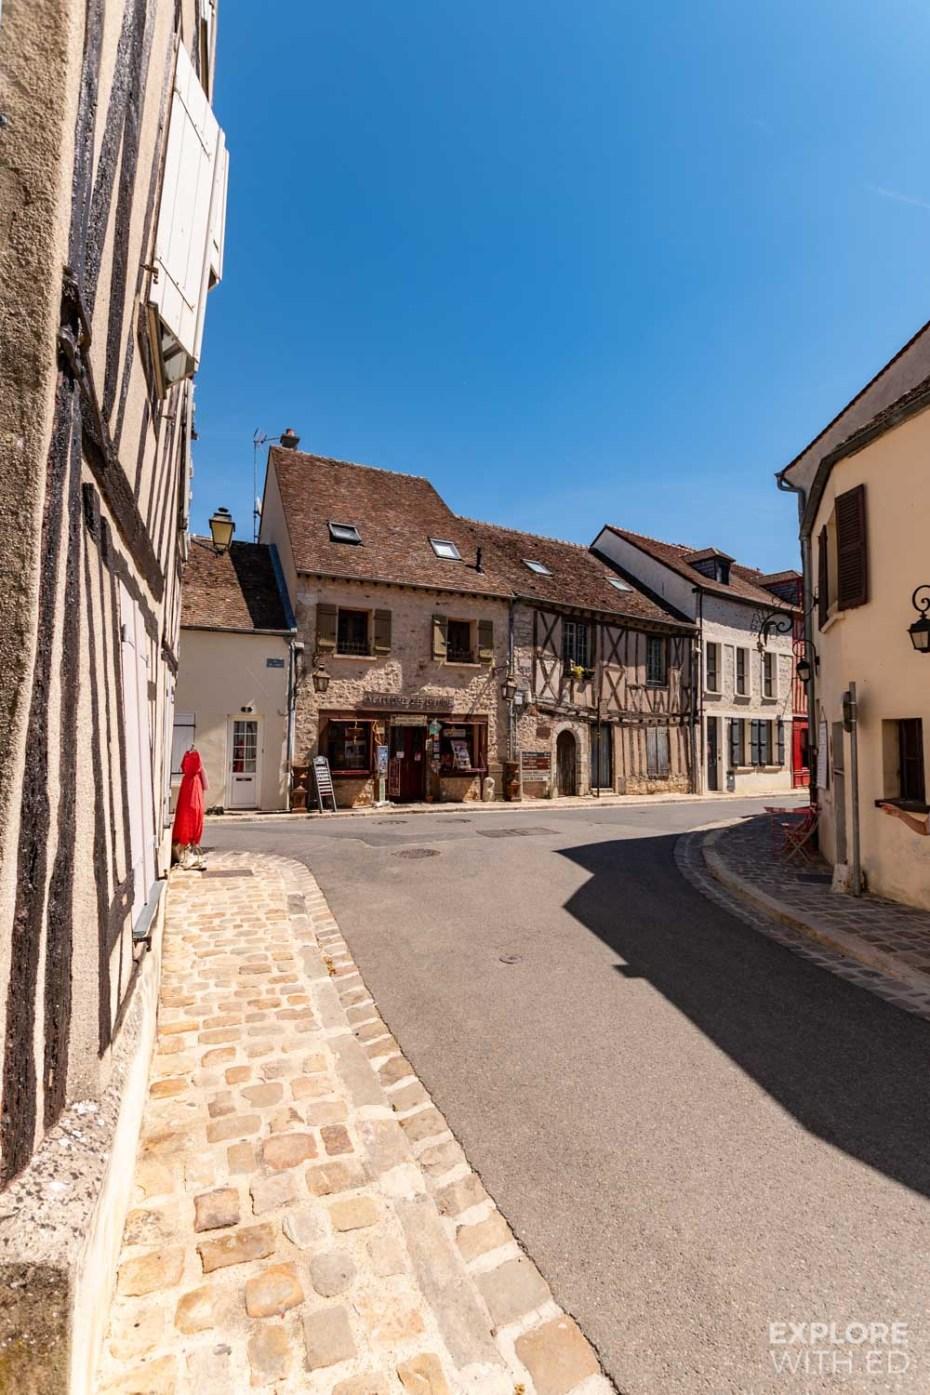 Rue Saint-Jean in Provins